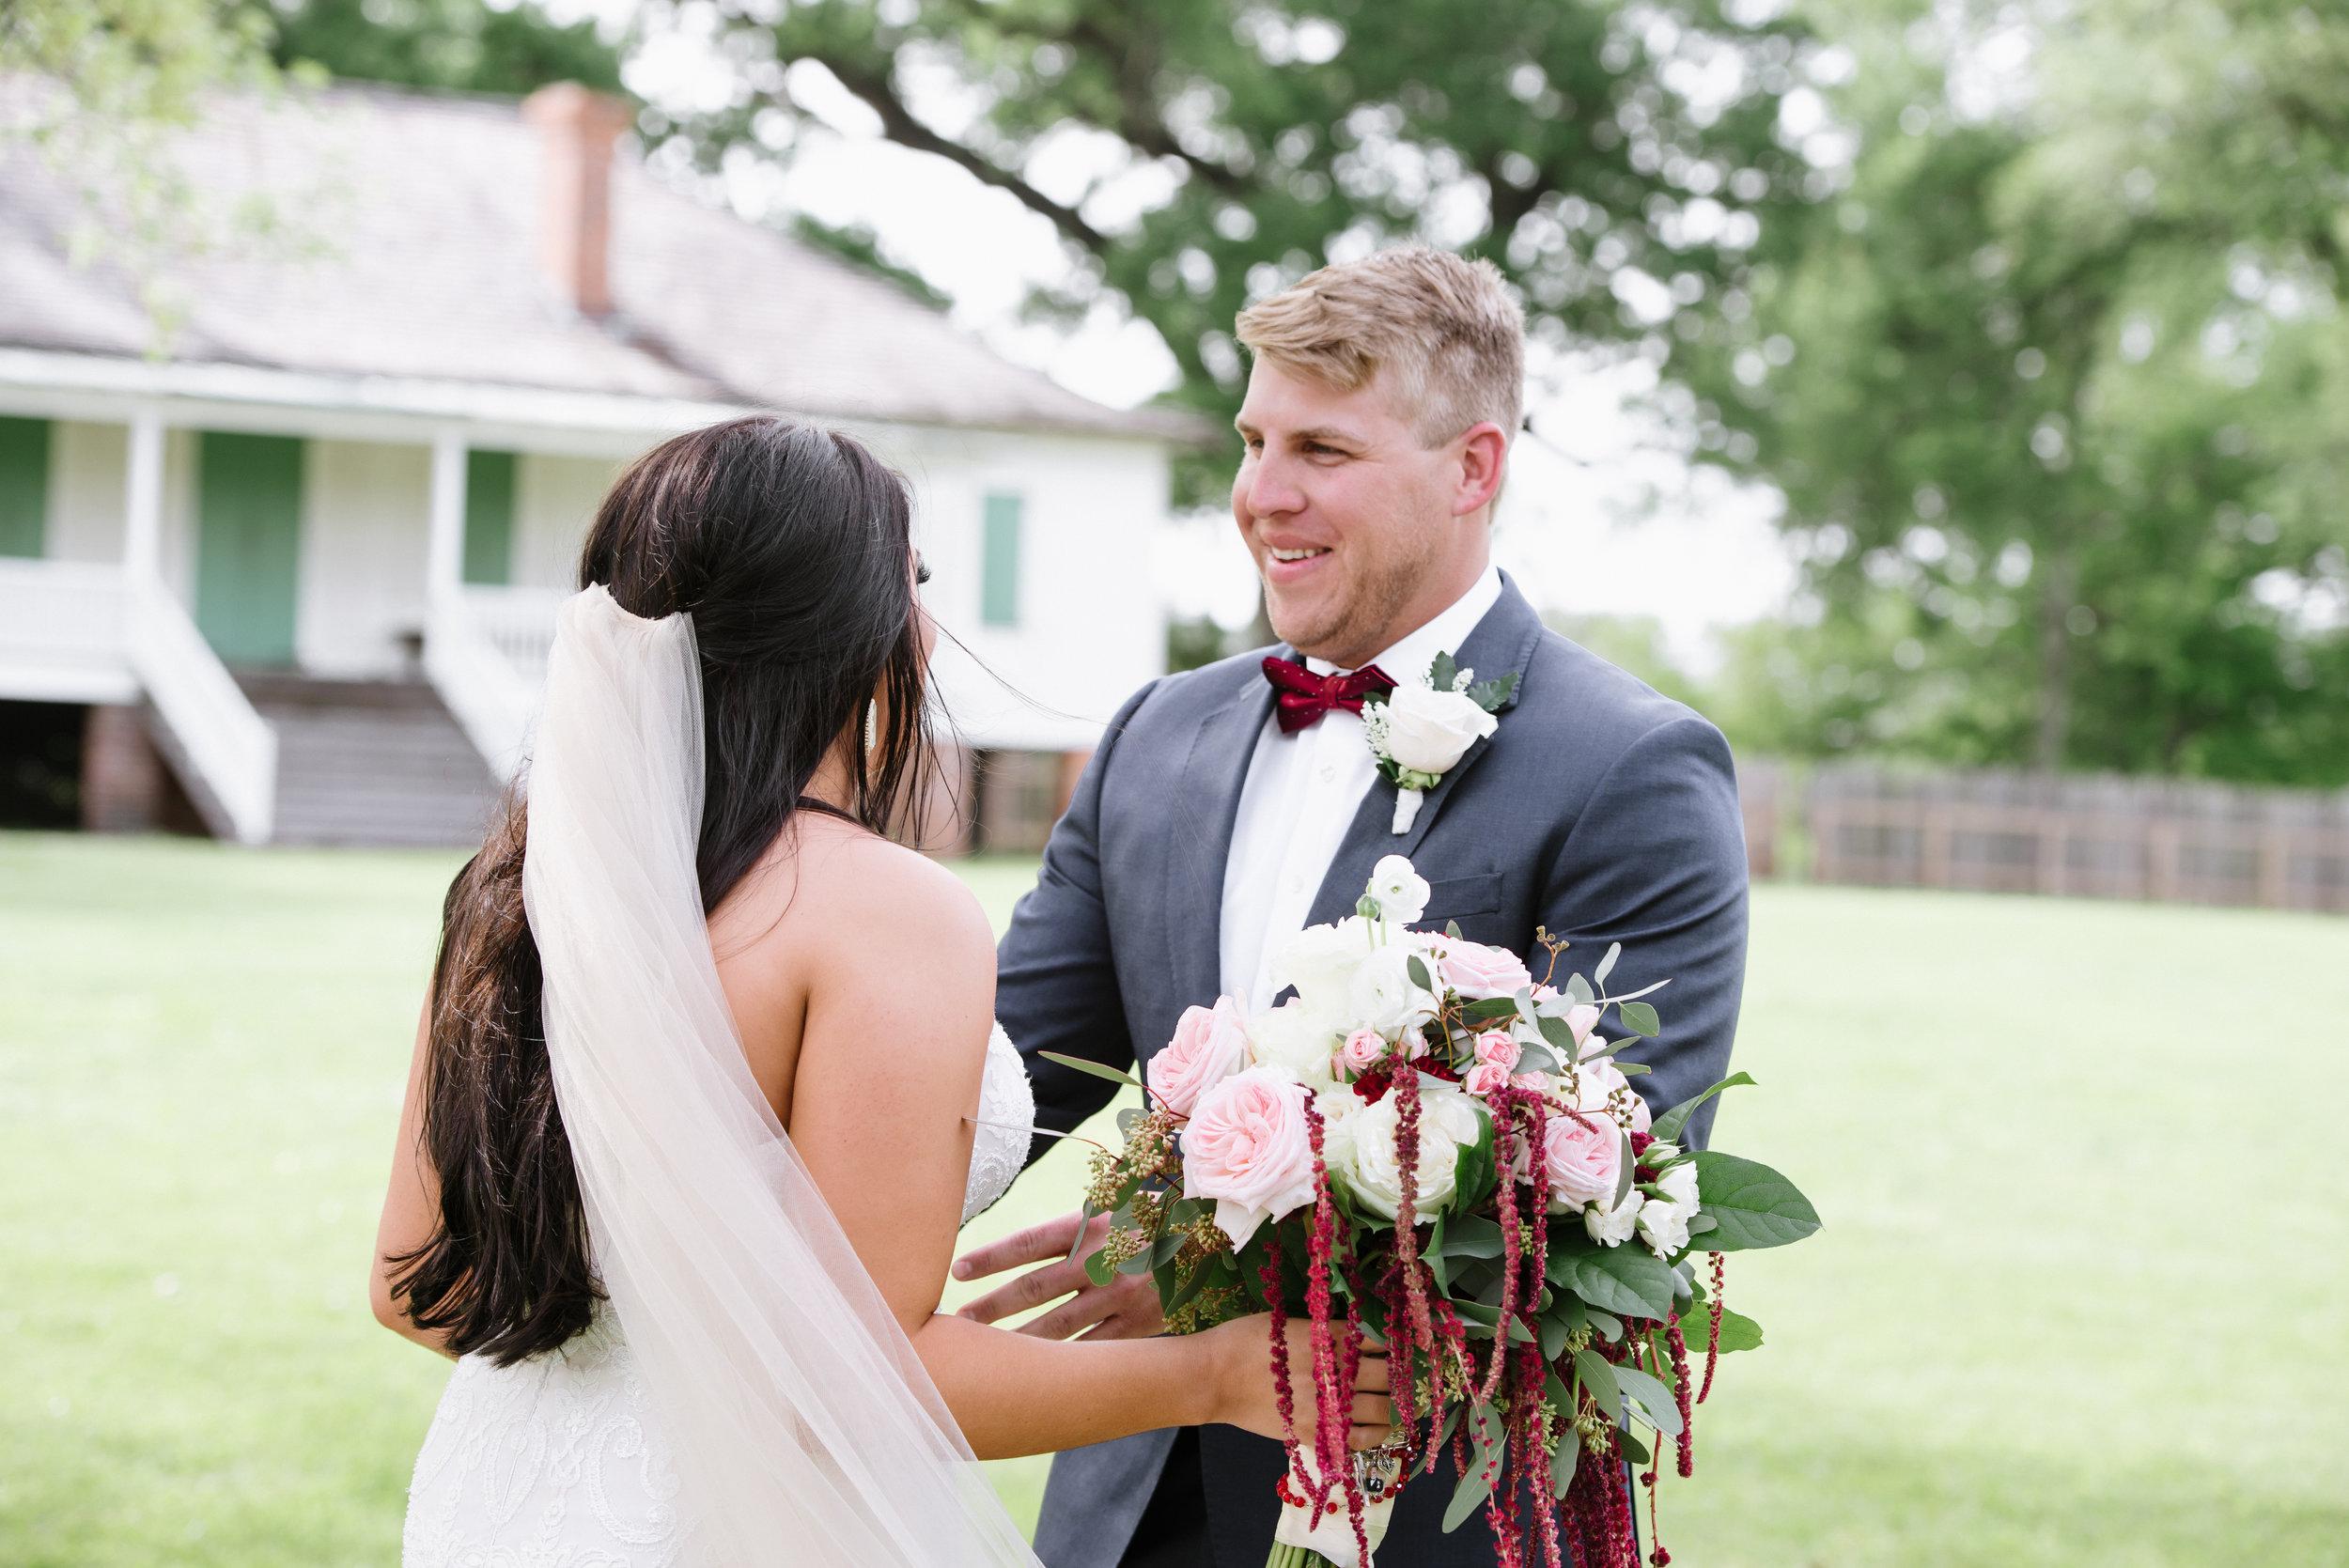 Magnolia-Mound-Plantation-wedding